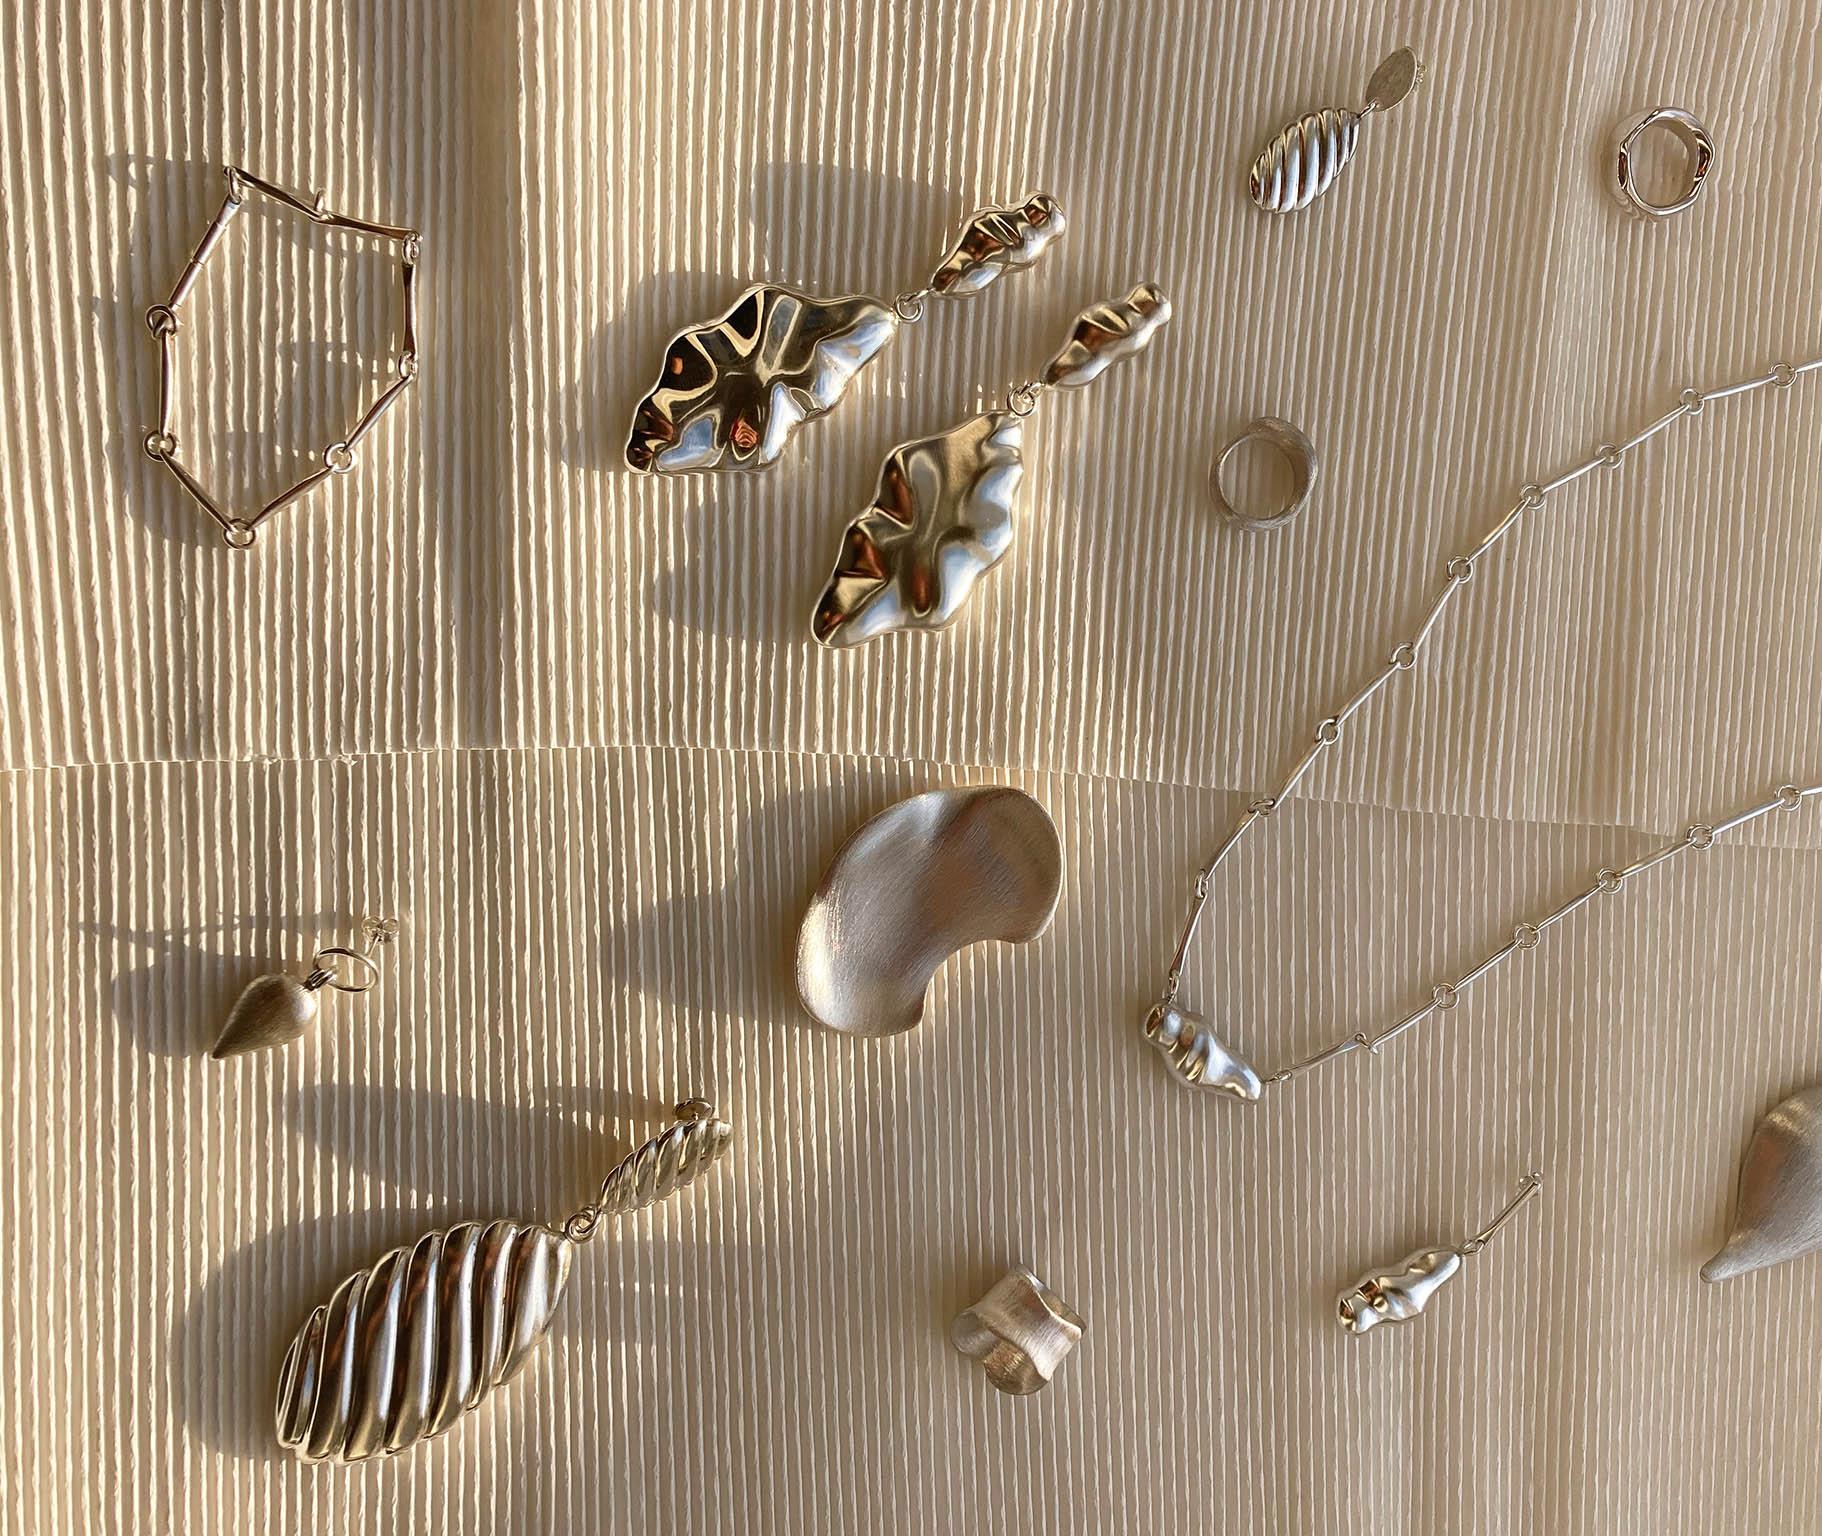 Šperky odMarie Kobelové zkolekce Euforia